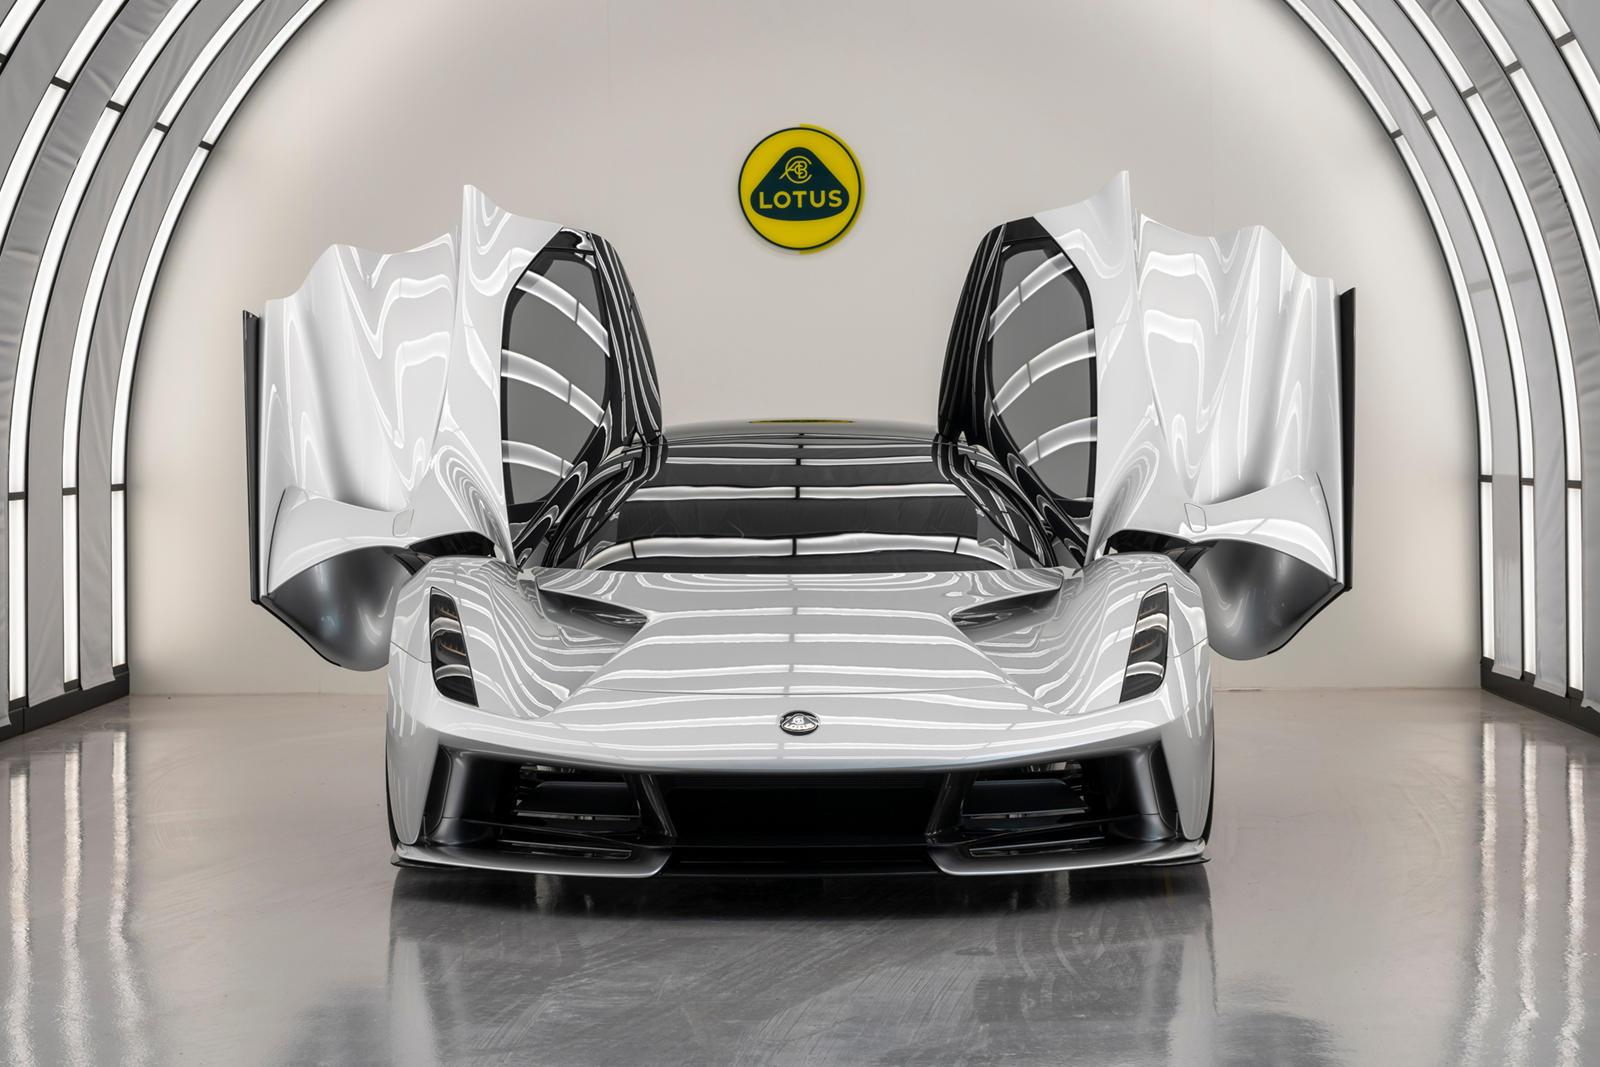 Lotus Evija Will Hit 186 MPH Faster Than A Bugatti Chiron